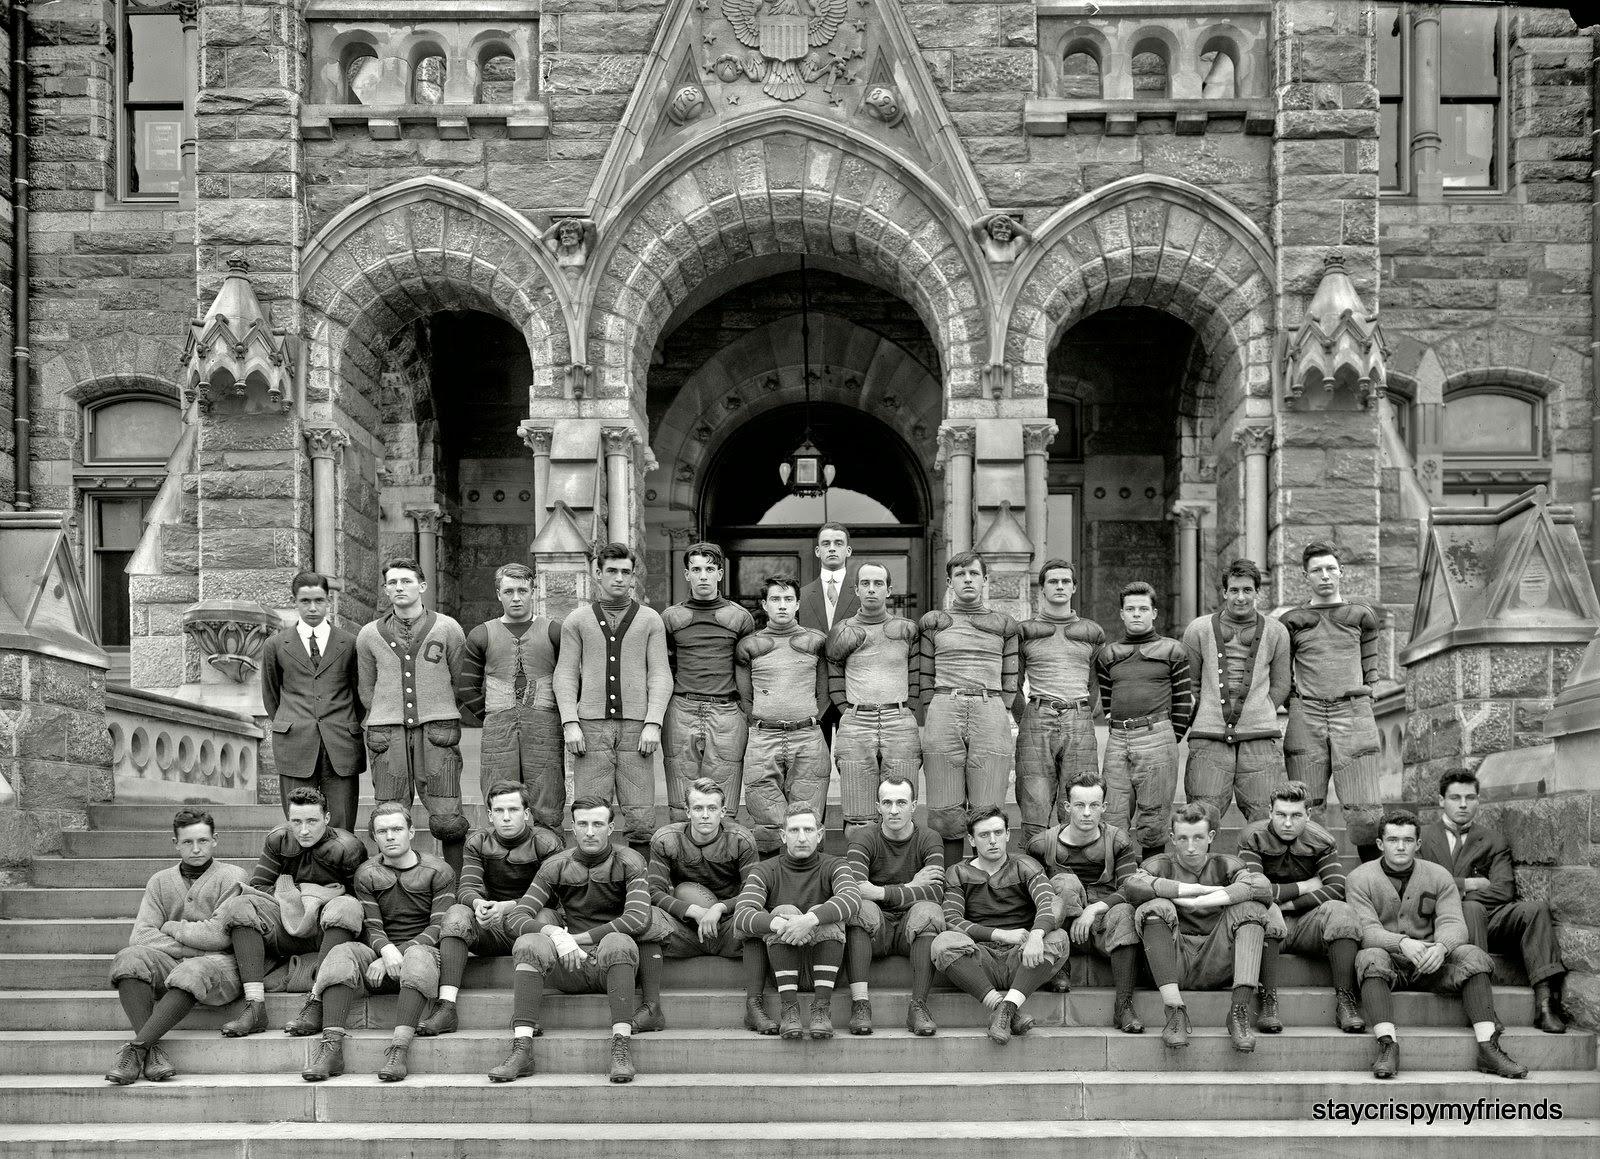 Georgetown University Football Team 1910 - StayCrispyMyFriends